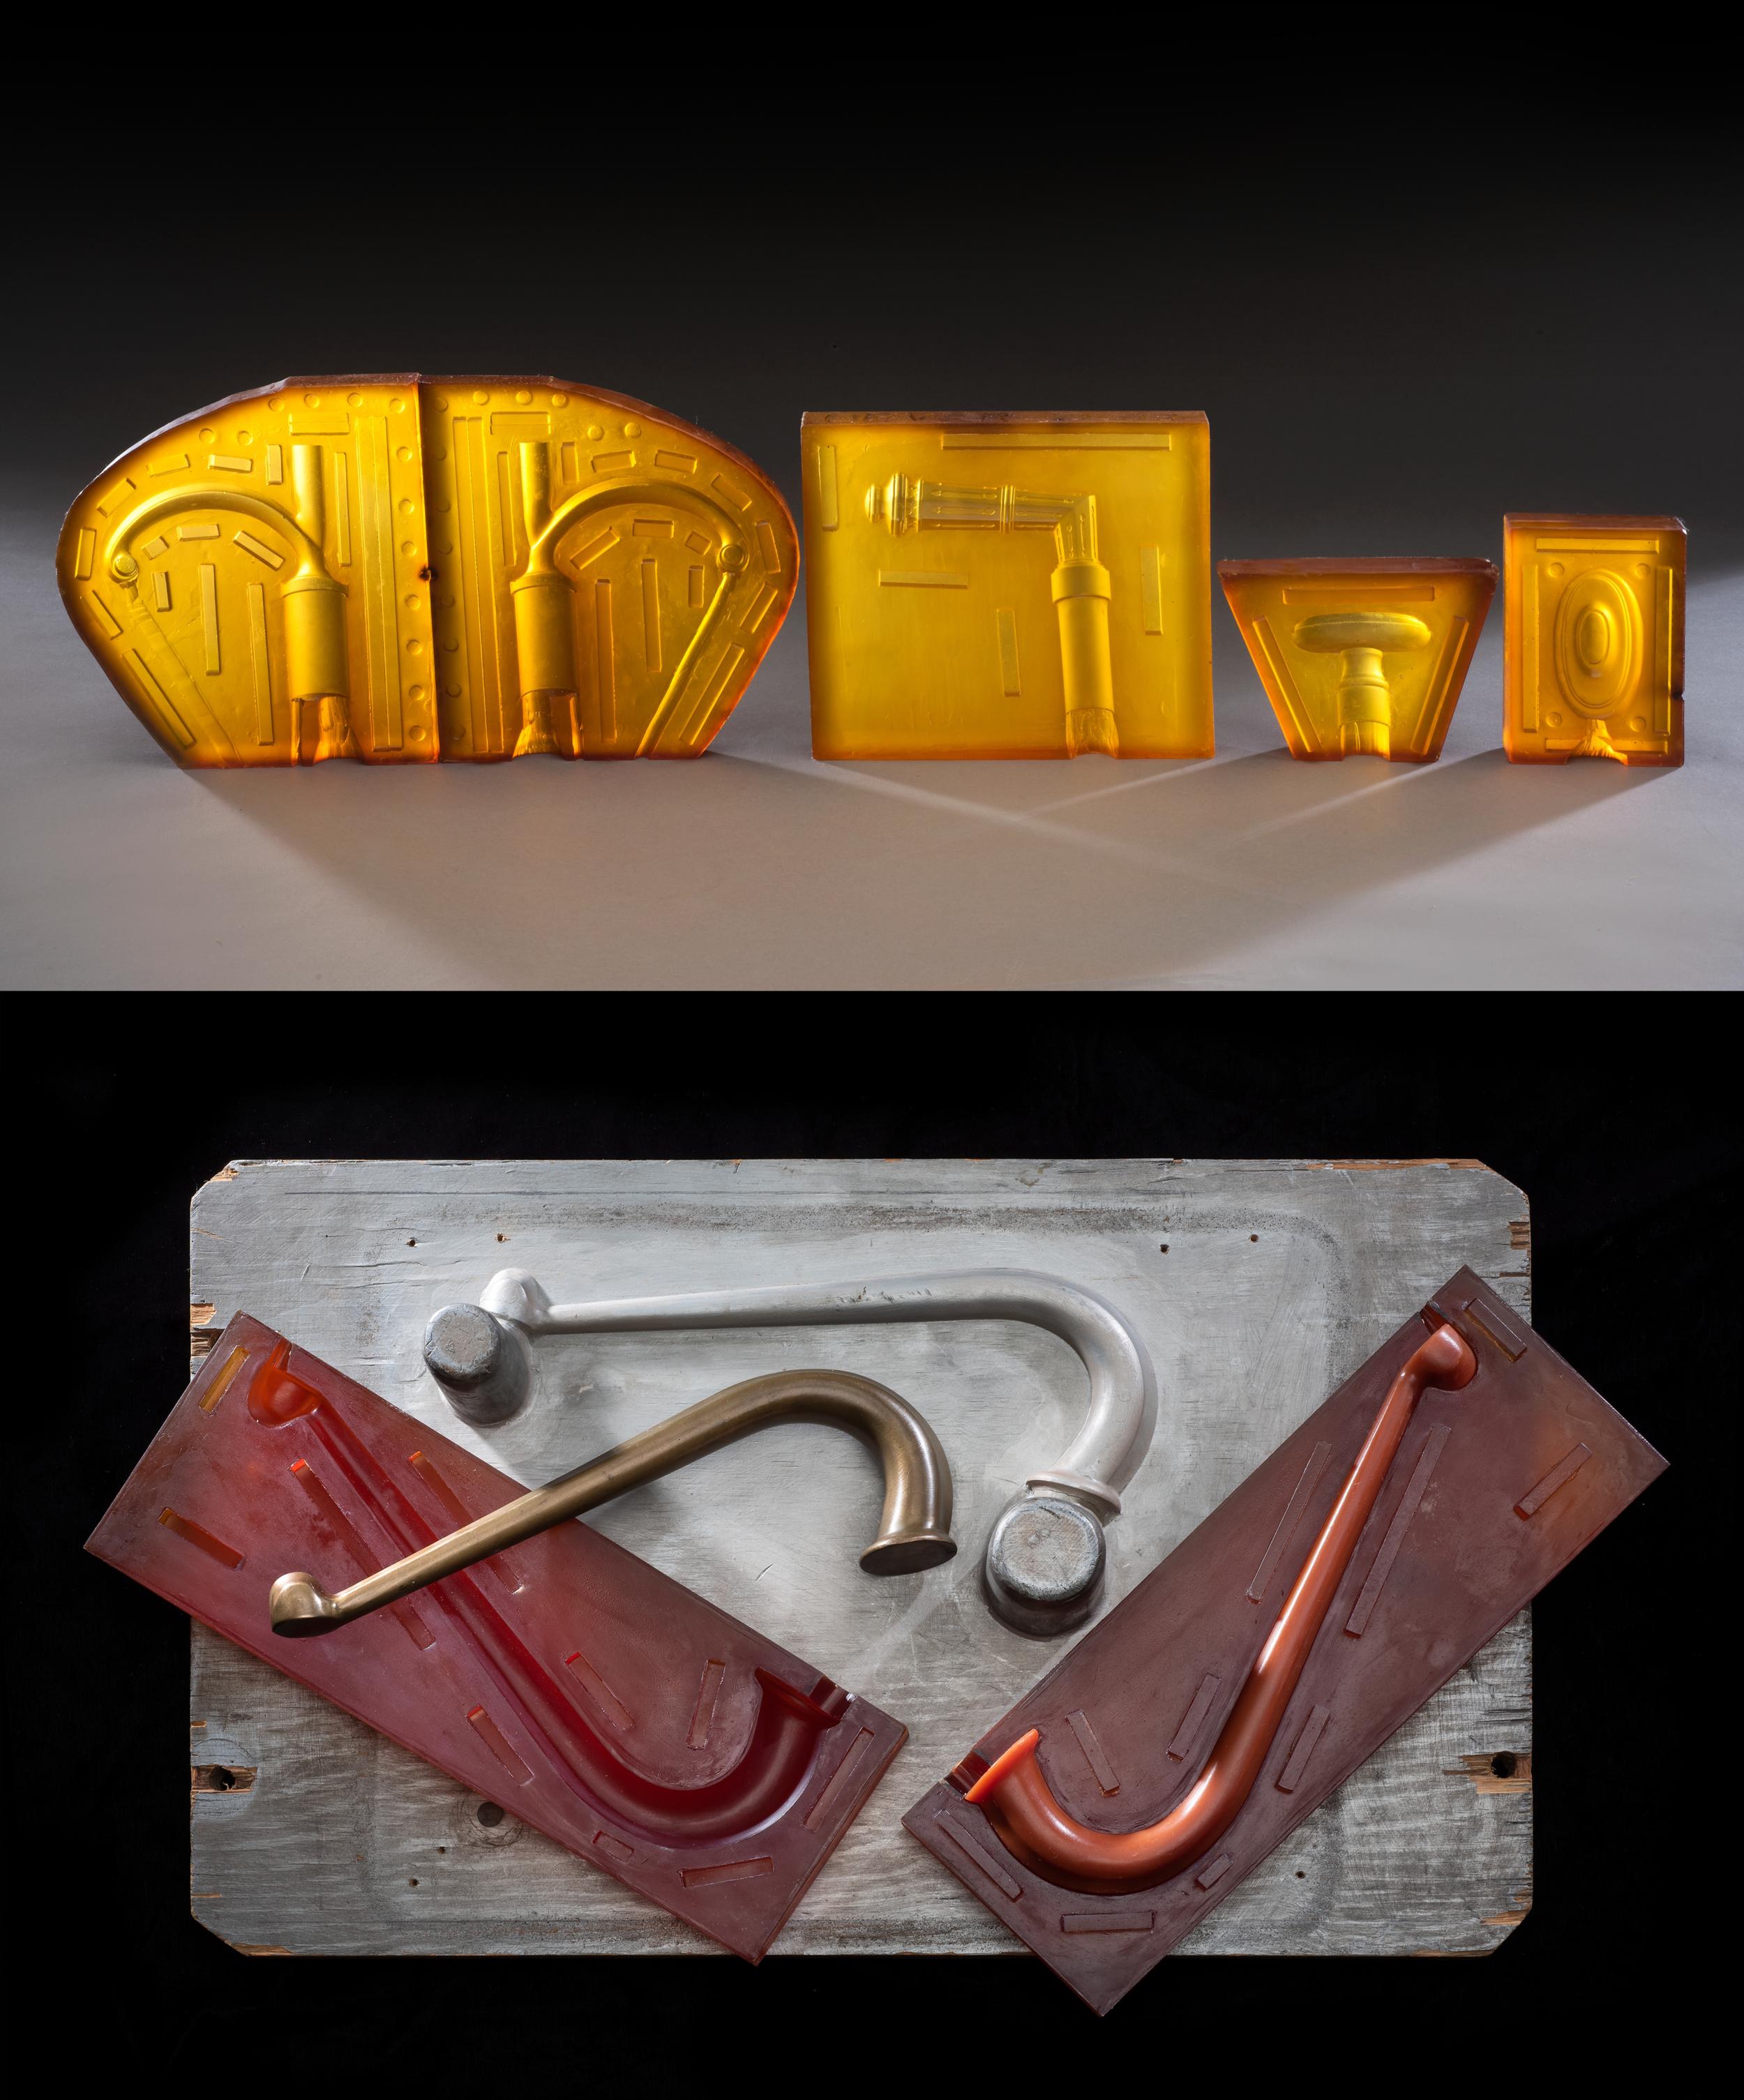 Patternmaker: Peter Morenstein, San Francisco